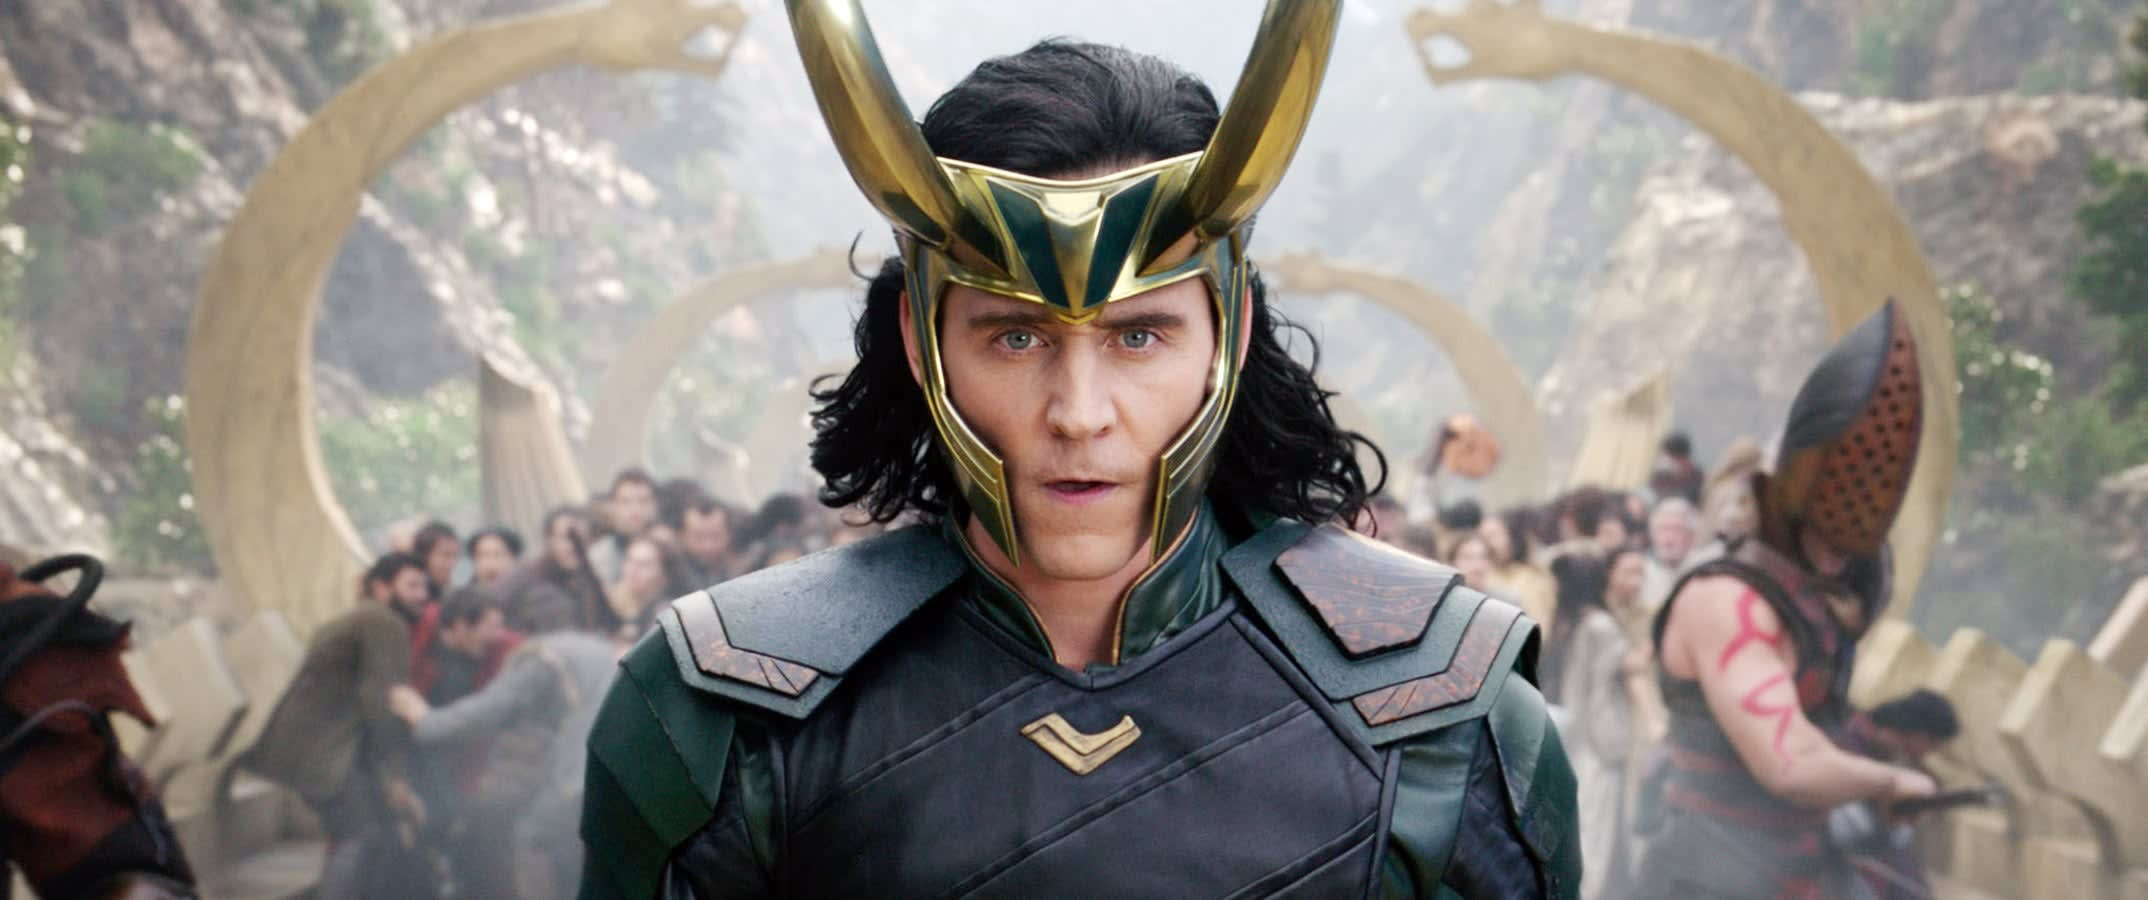 "Tom Hiddleston as Loki in ""Thor Ragnarok"""